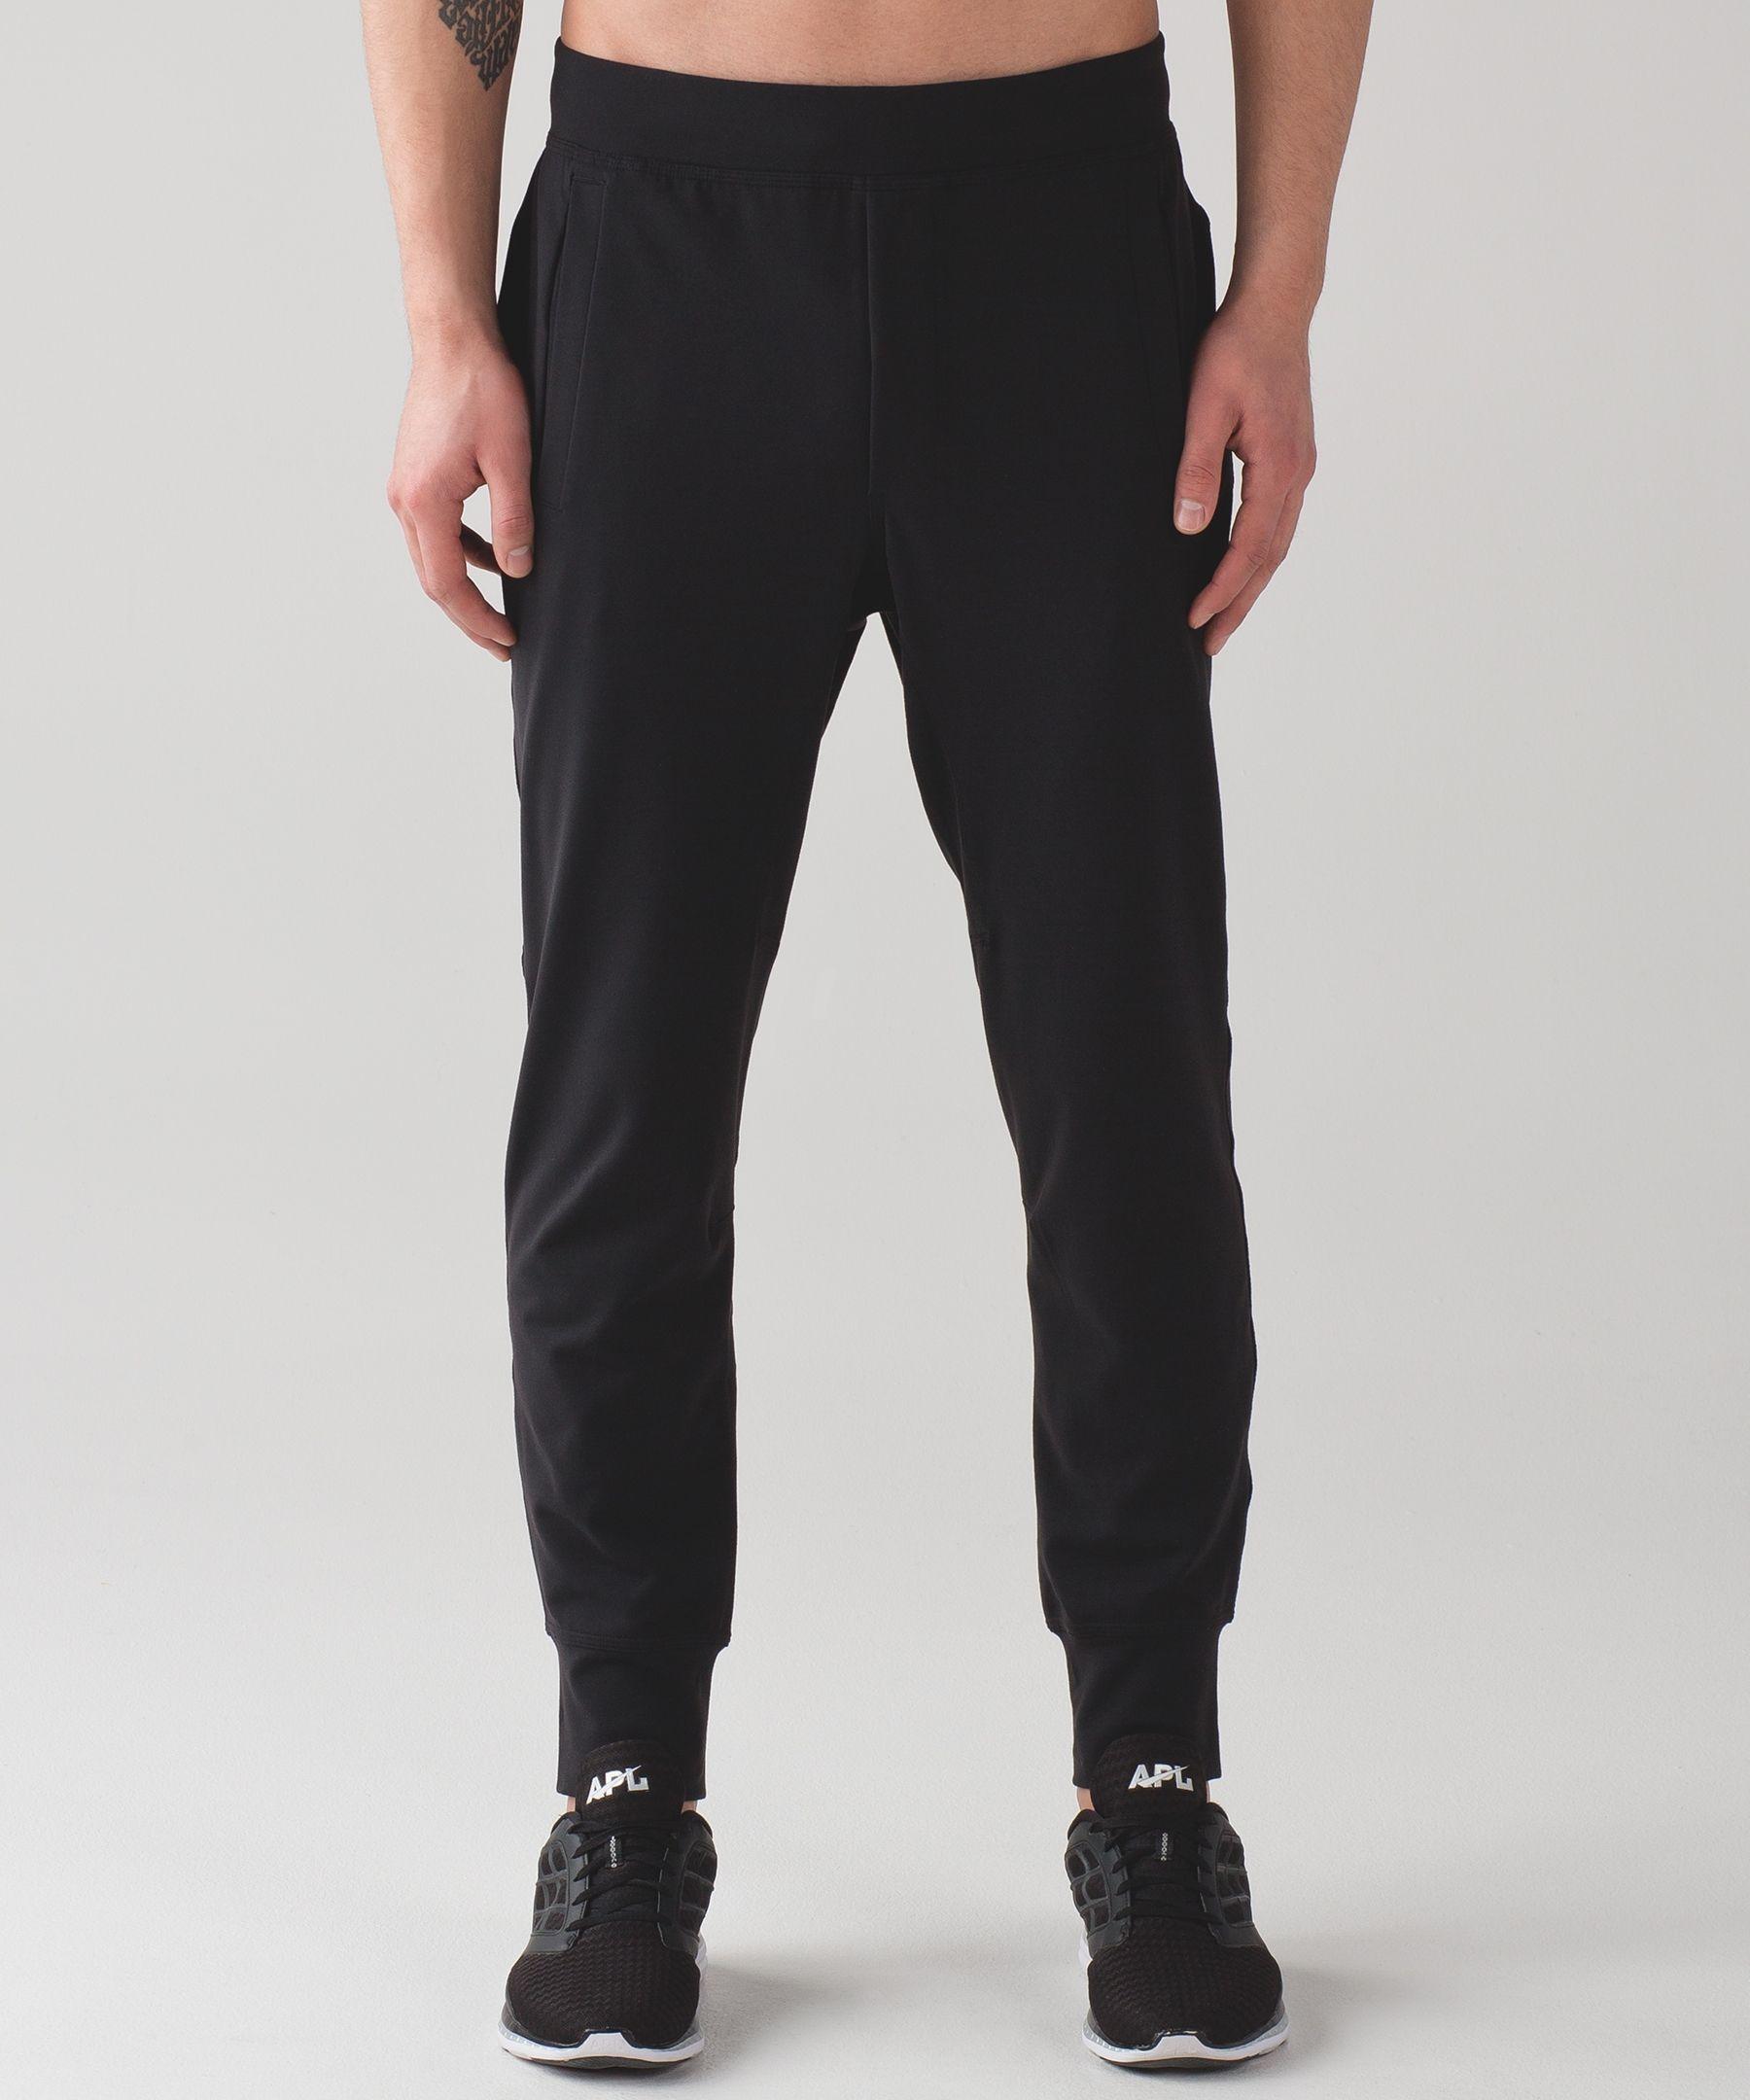 206f1f38c Men's Yoga Pants - (Black, Size XXL) - Intent Pant - lululemon | A ...